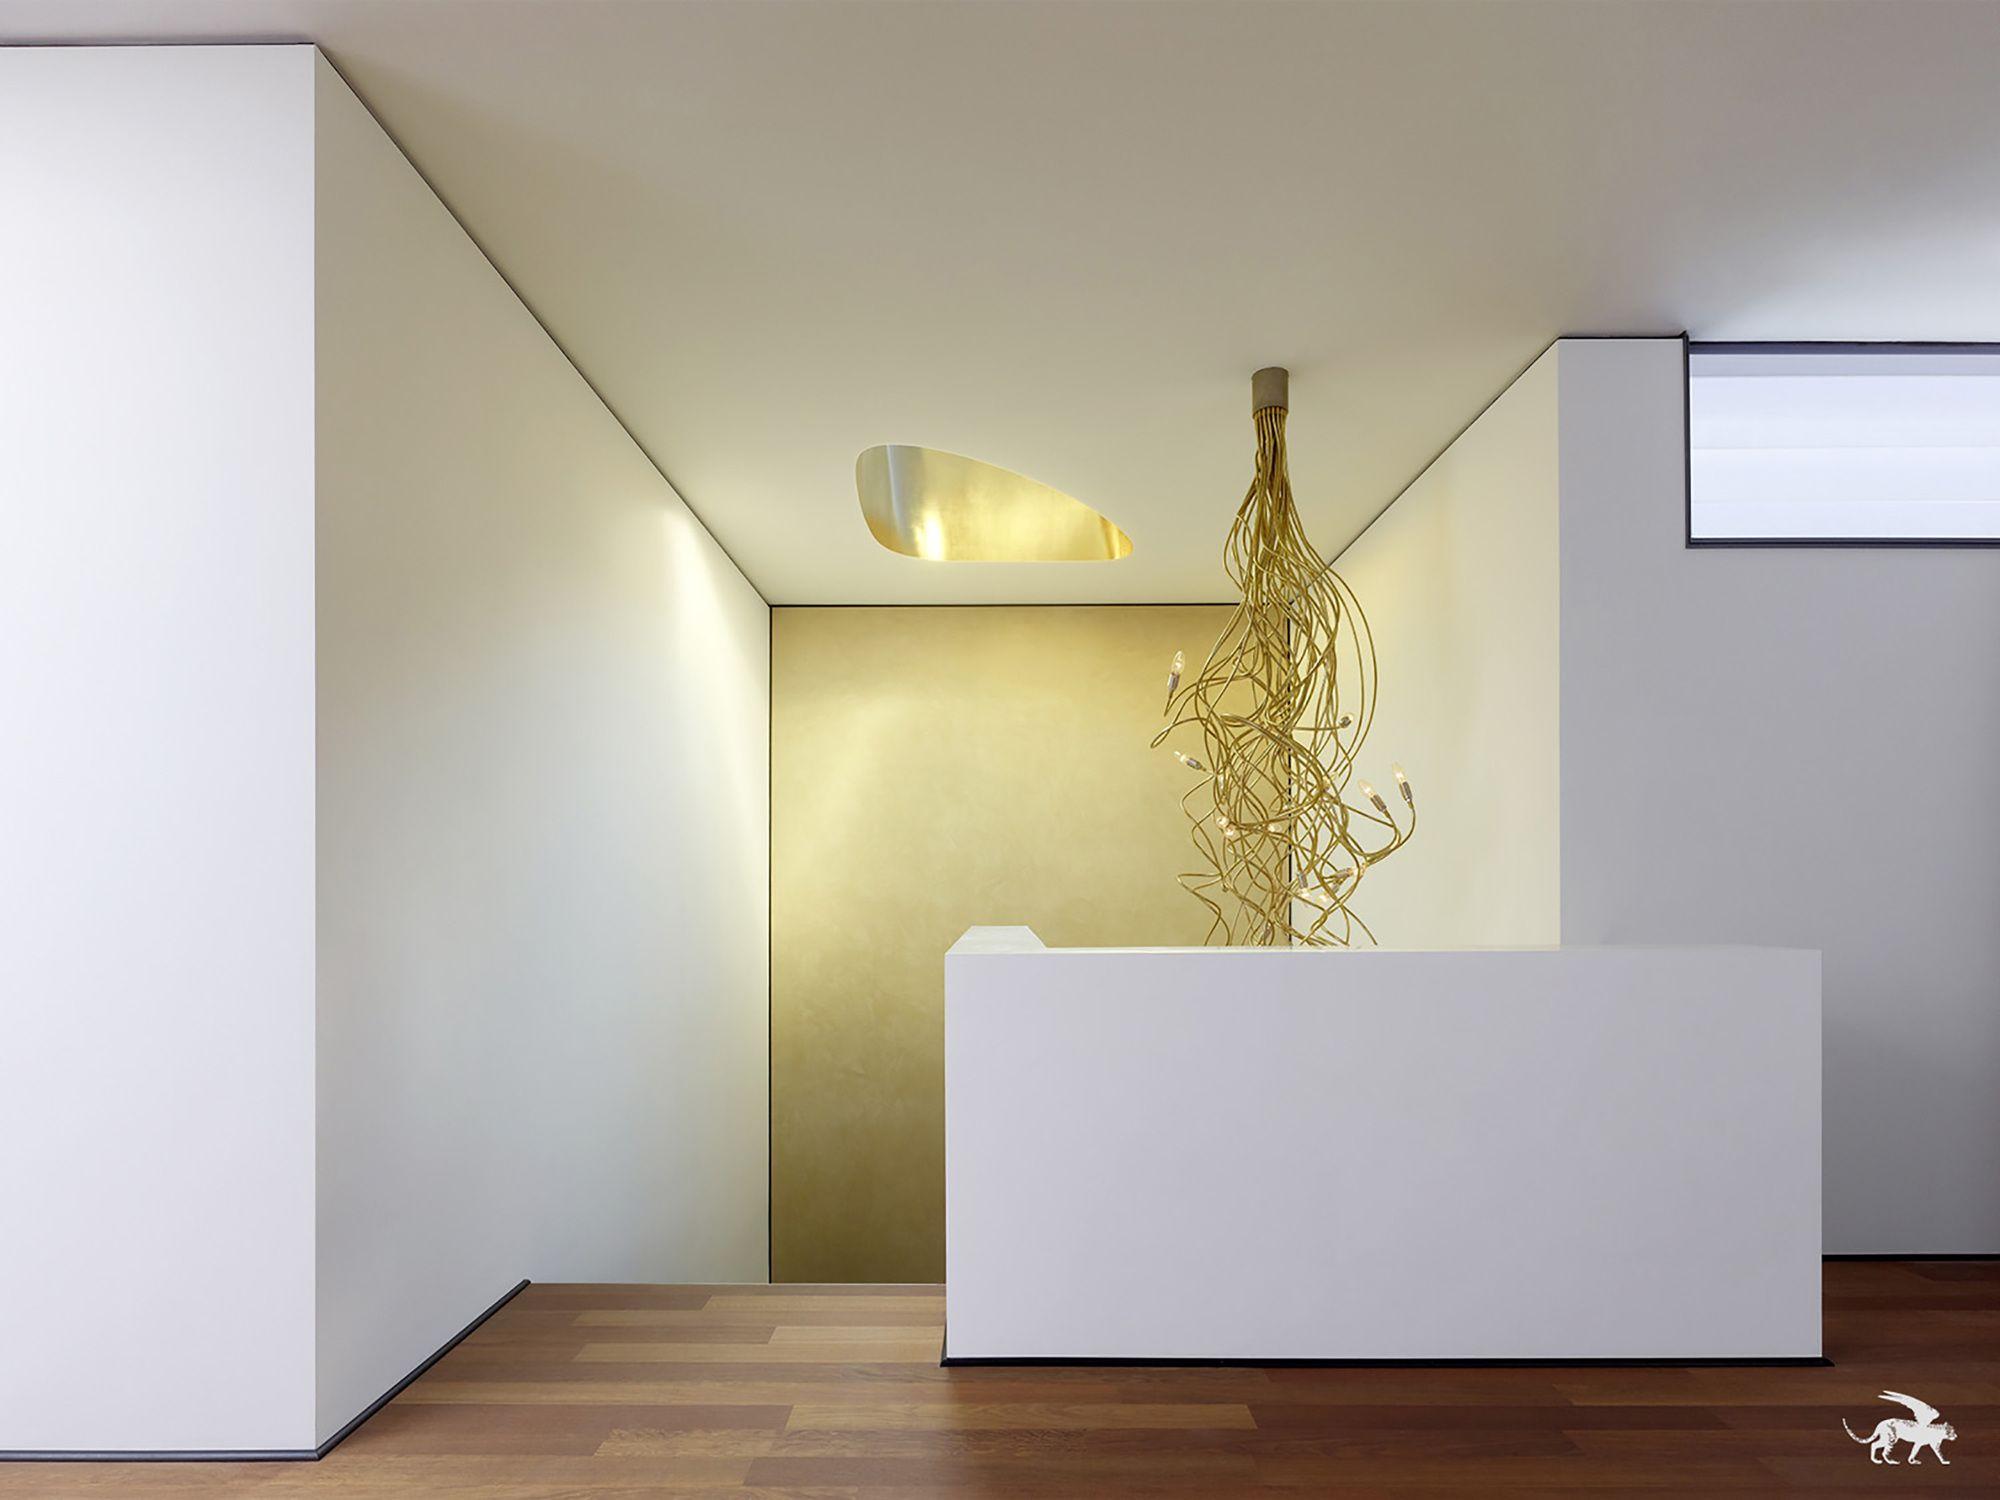 Galeria - Casa SU / Alexander Brenner Architects - 131